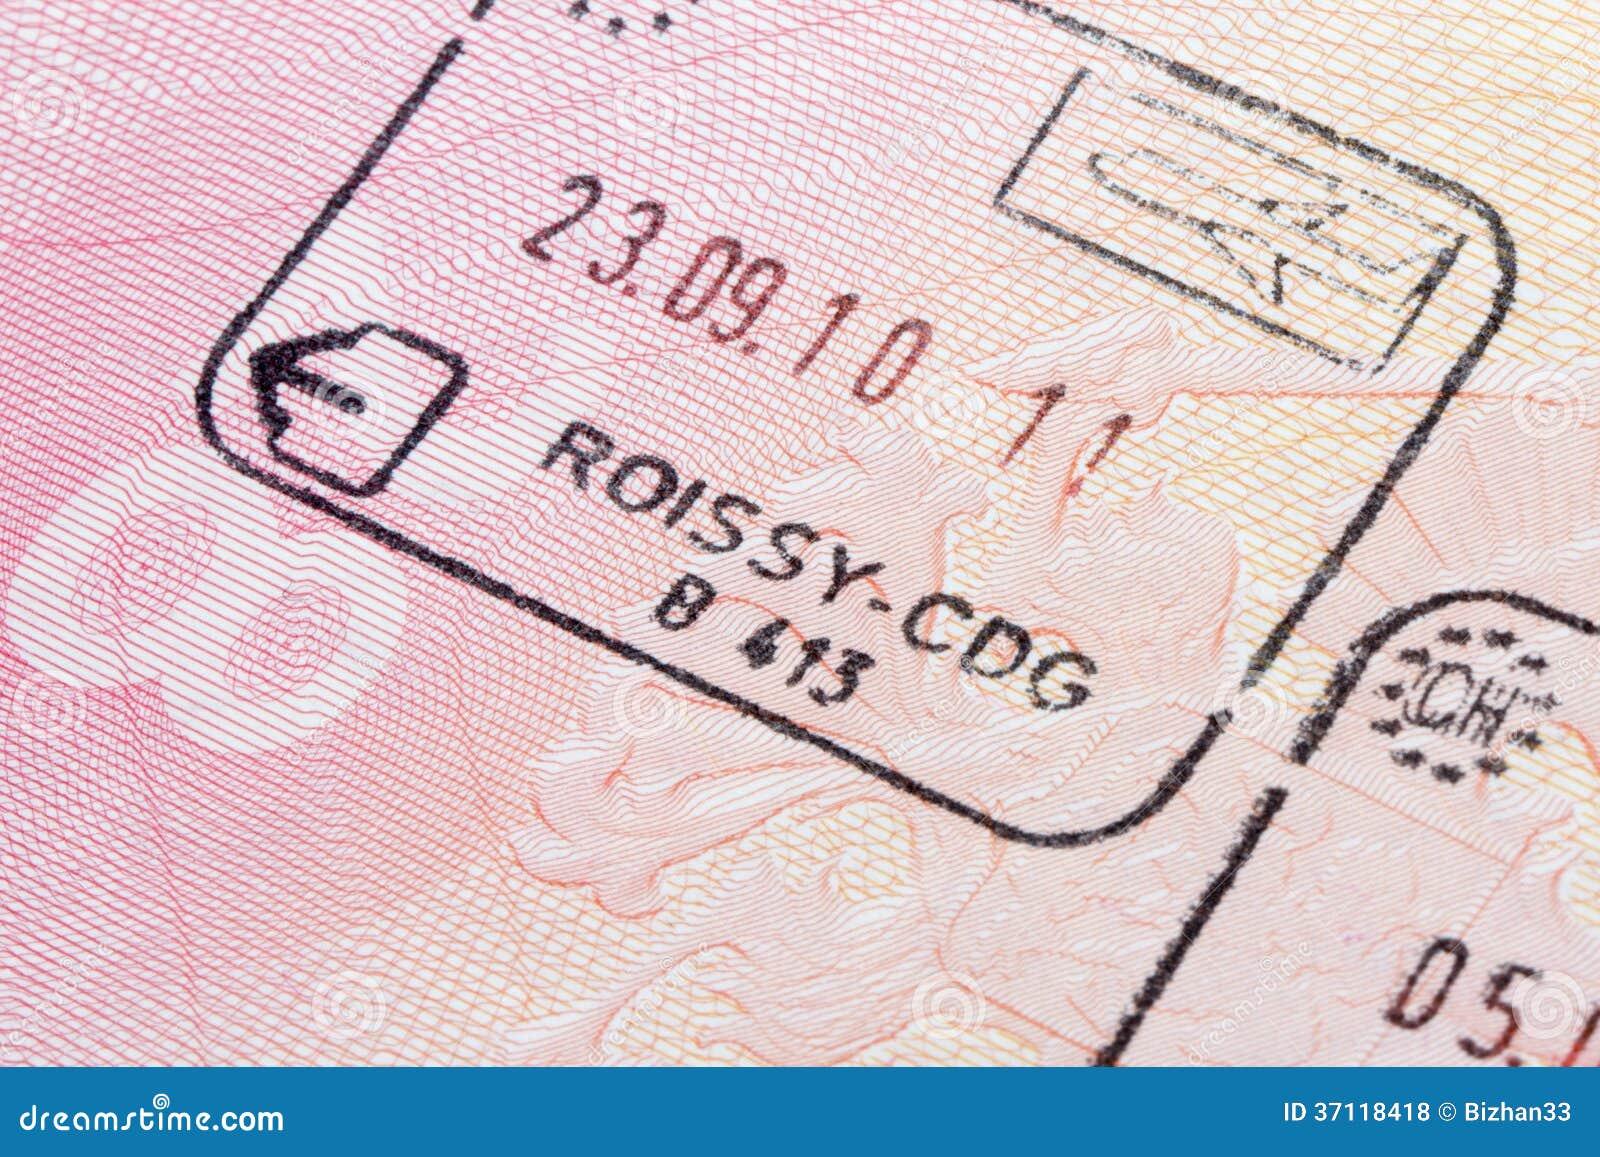 map of french polynesia with Royalty Free Stock Photos French Immigration St  Passport Image37118418 on Algeria additionally Rangiroa also Polynesie Francaise Paysages also Papeete 24 Heures A La Decouverte De La Capitale Polynesienne also Rangiroa.